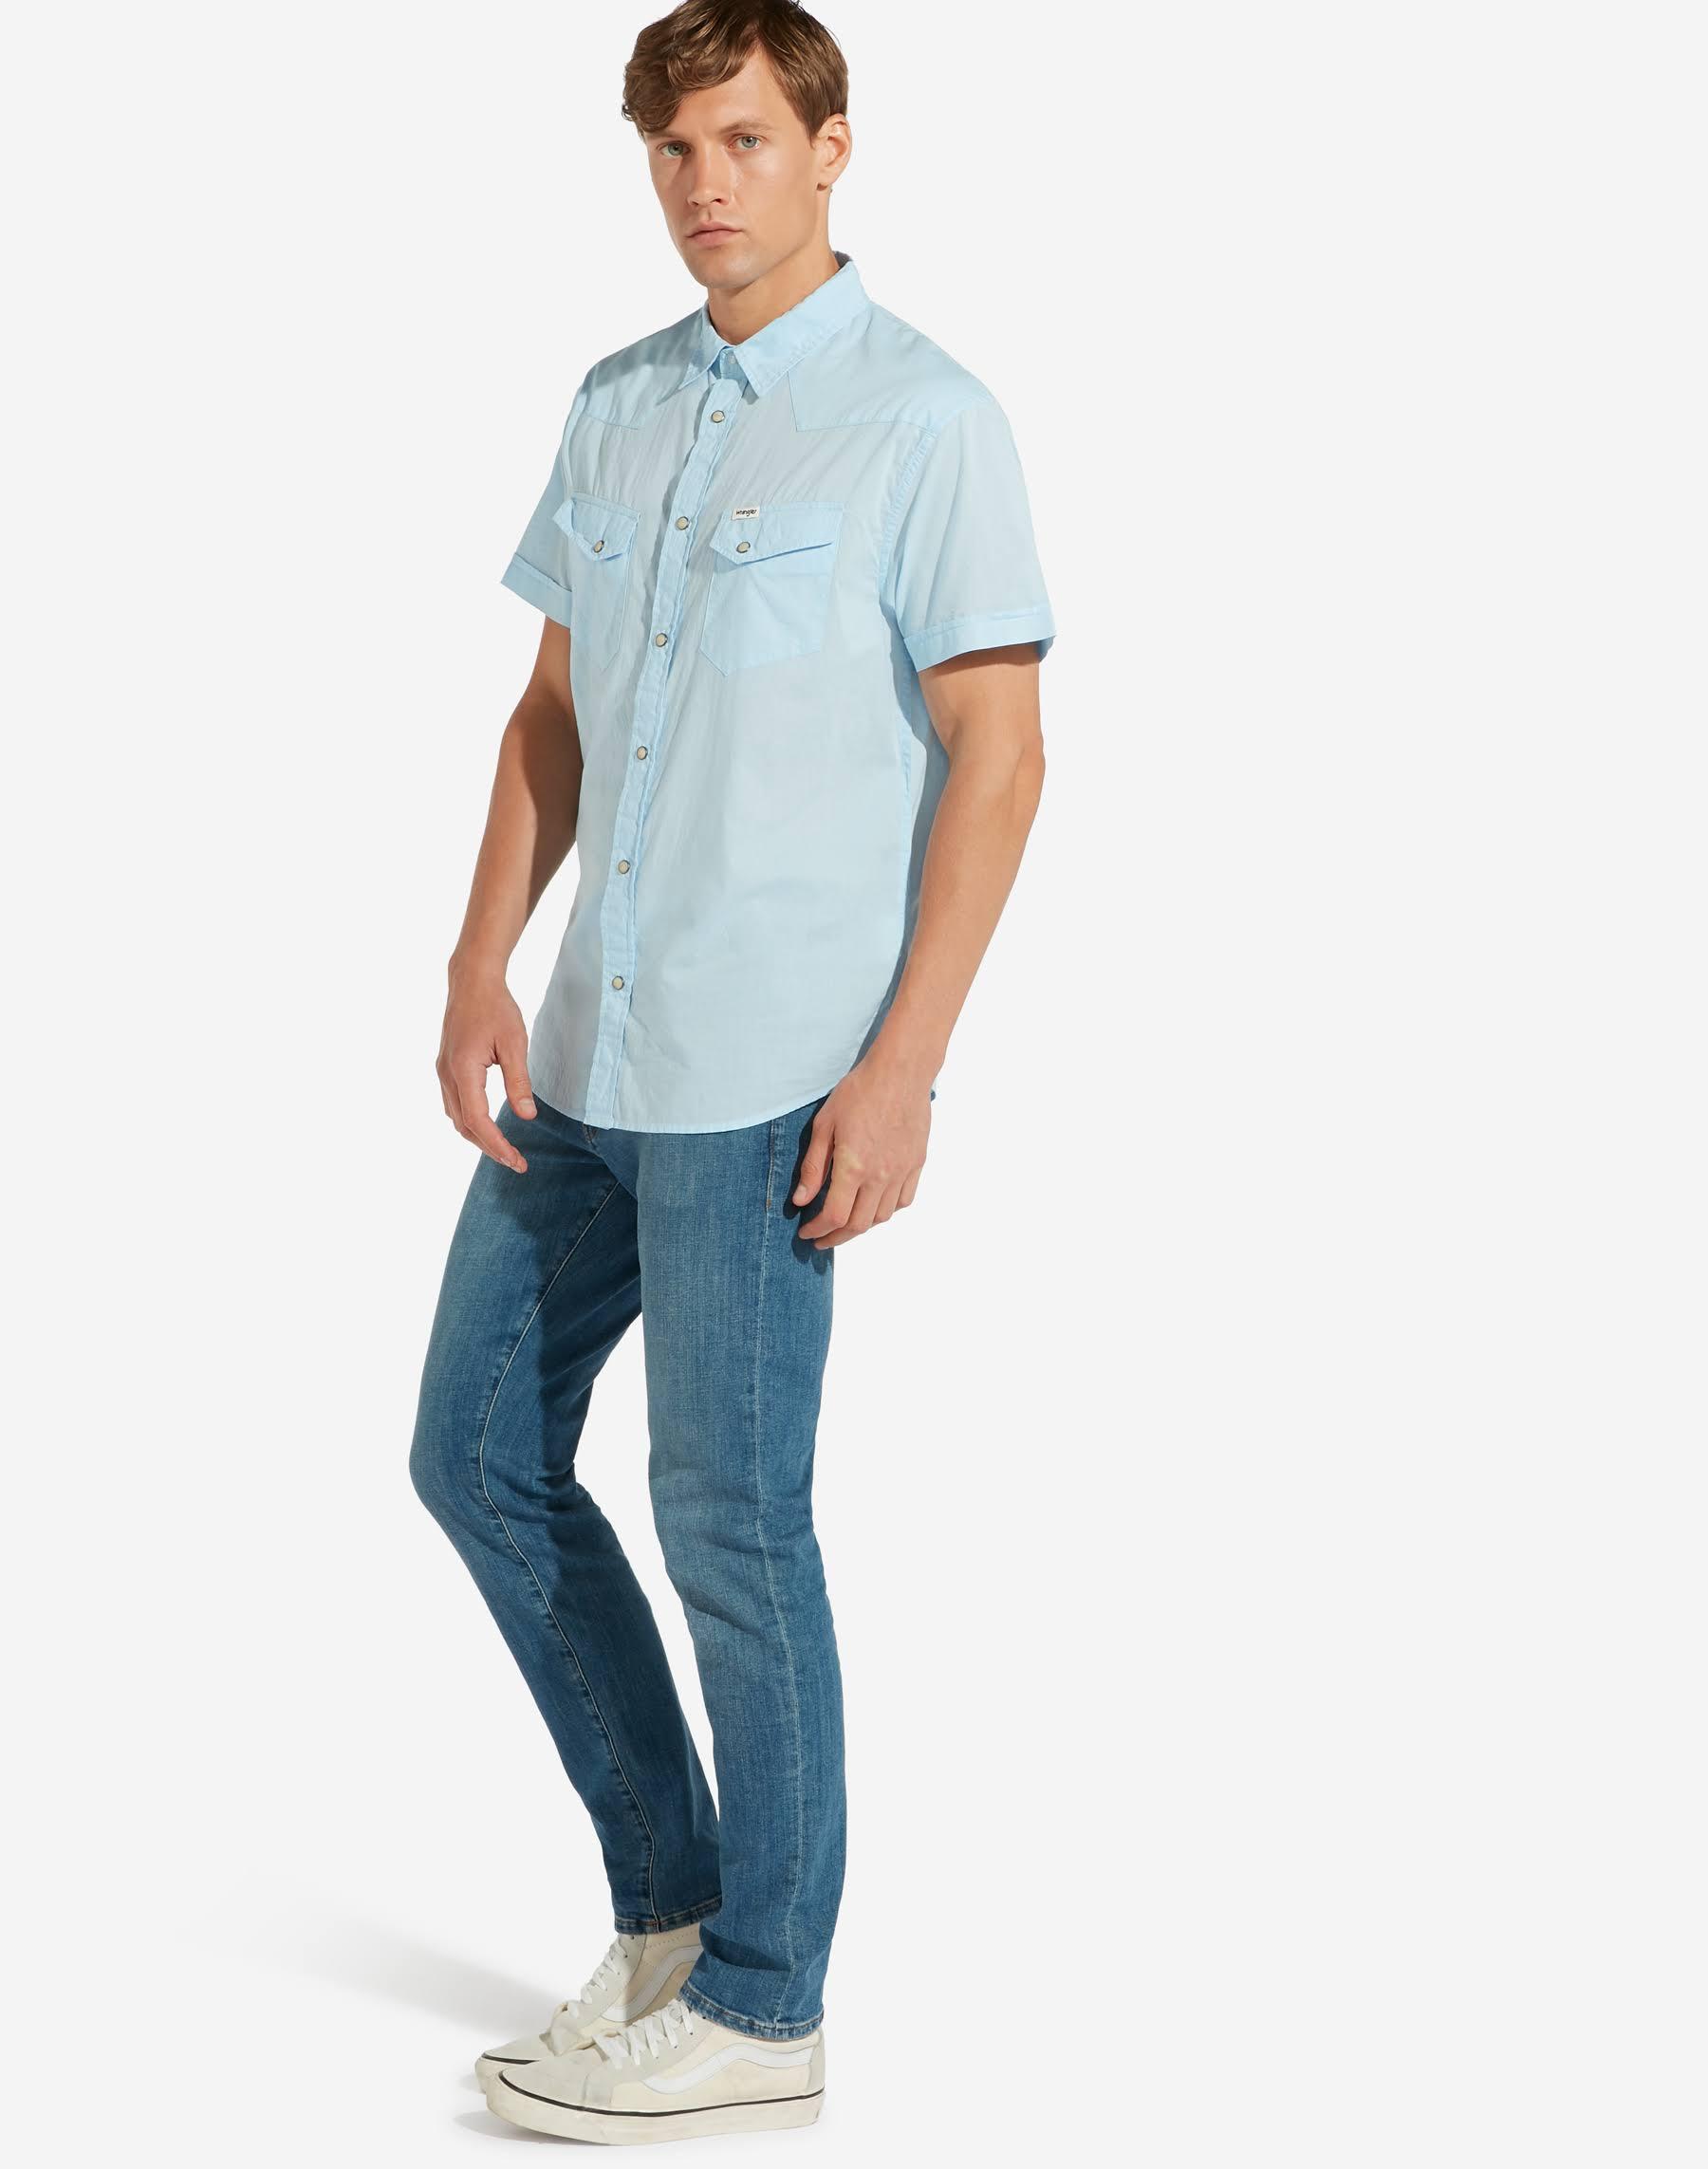 Cerulean Western Shirt M Hombre Talla Azul Wrangler Claro qHwtB1nt